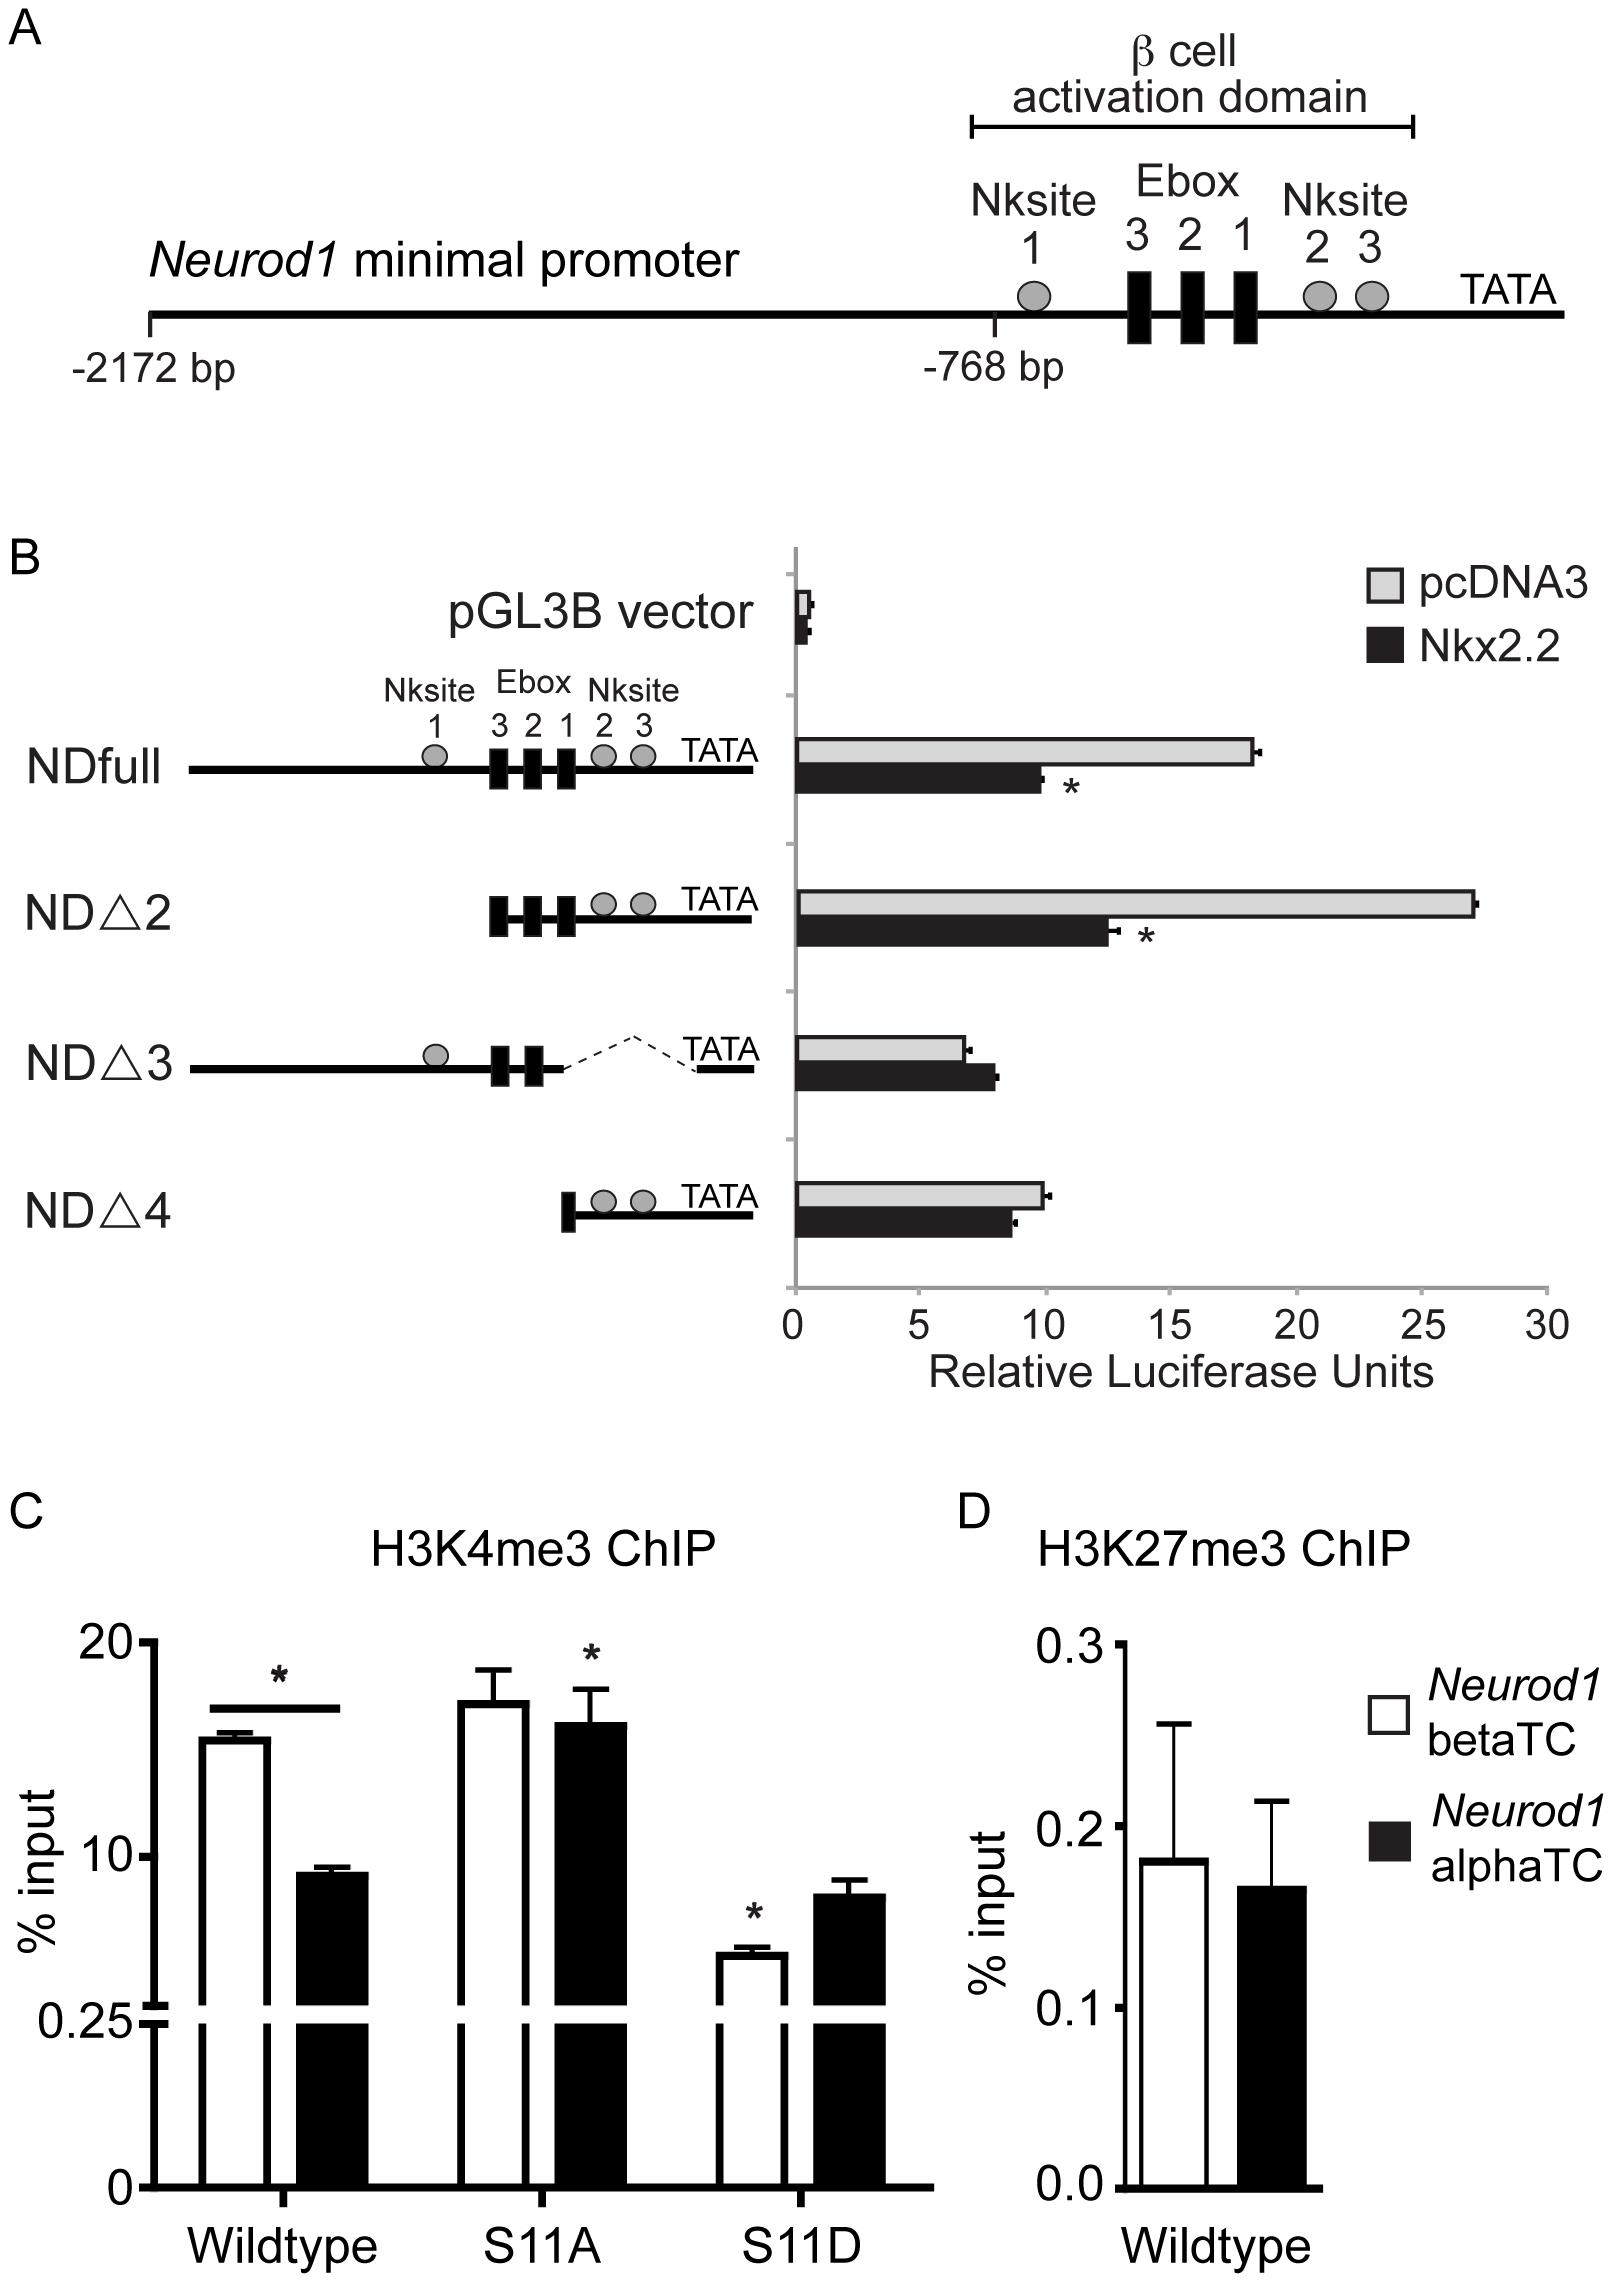 Nkx2.2 represses the <i>Neurod1</i> promoter in alphaTC1 cells.